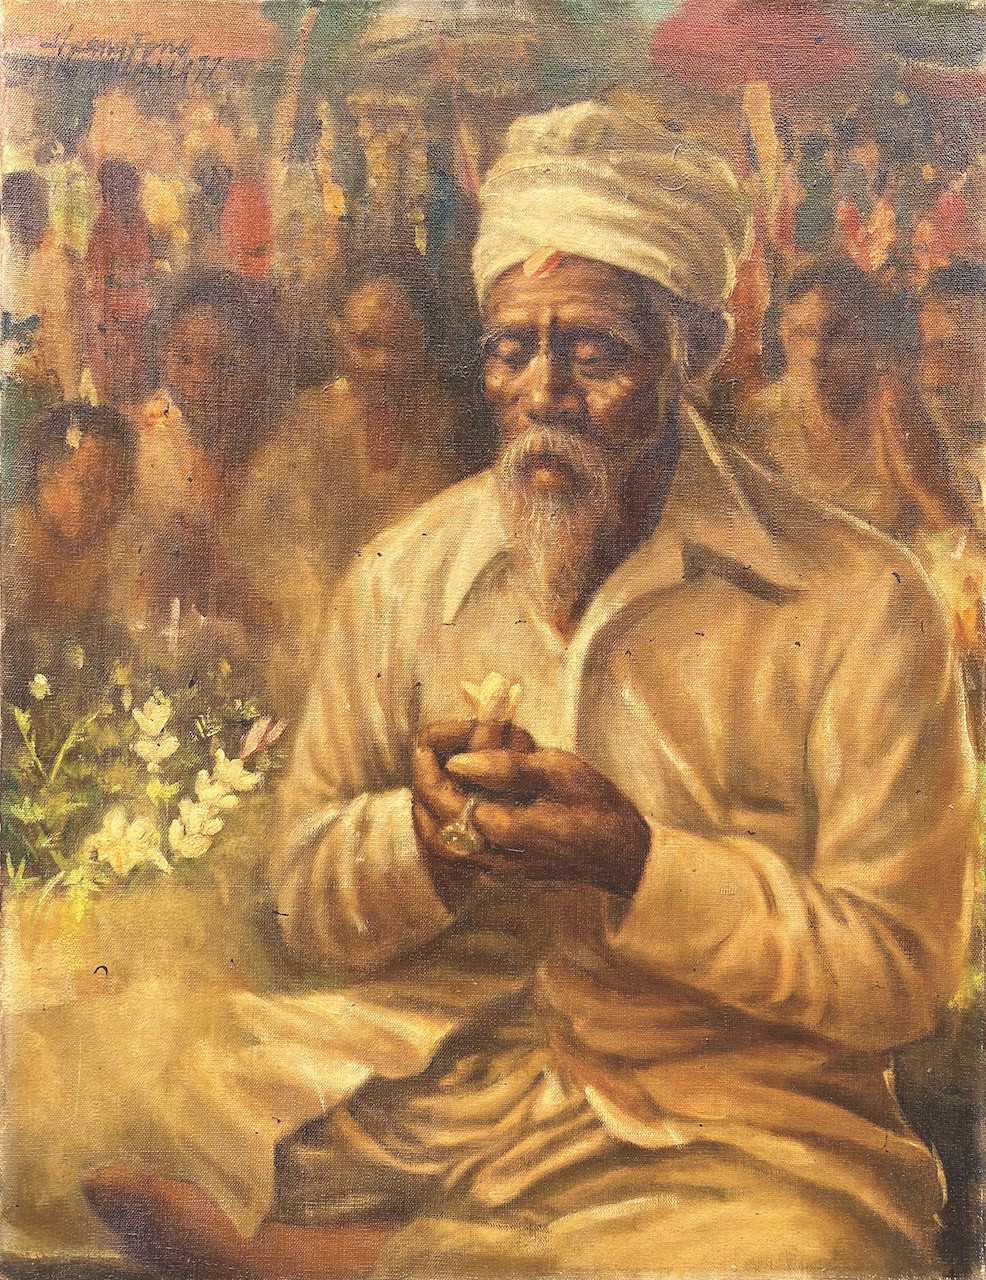 Lot 820 'Pemangku Sedang Mebakti' (1977) by Huang Fong, oil on canvas, 60 x 50 cm